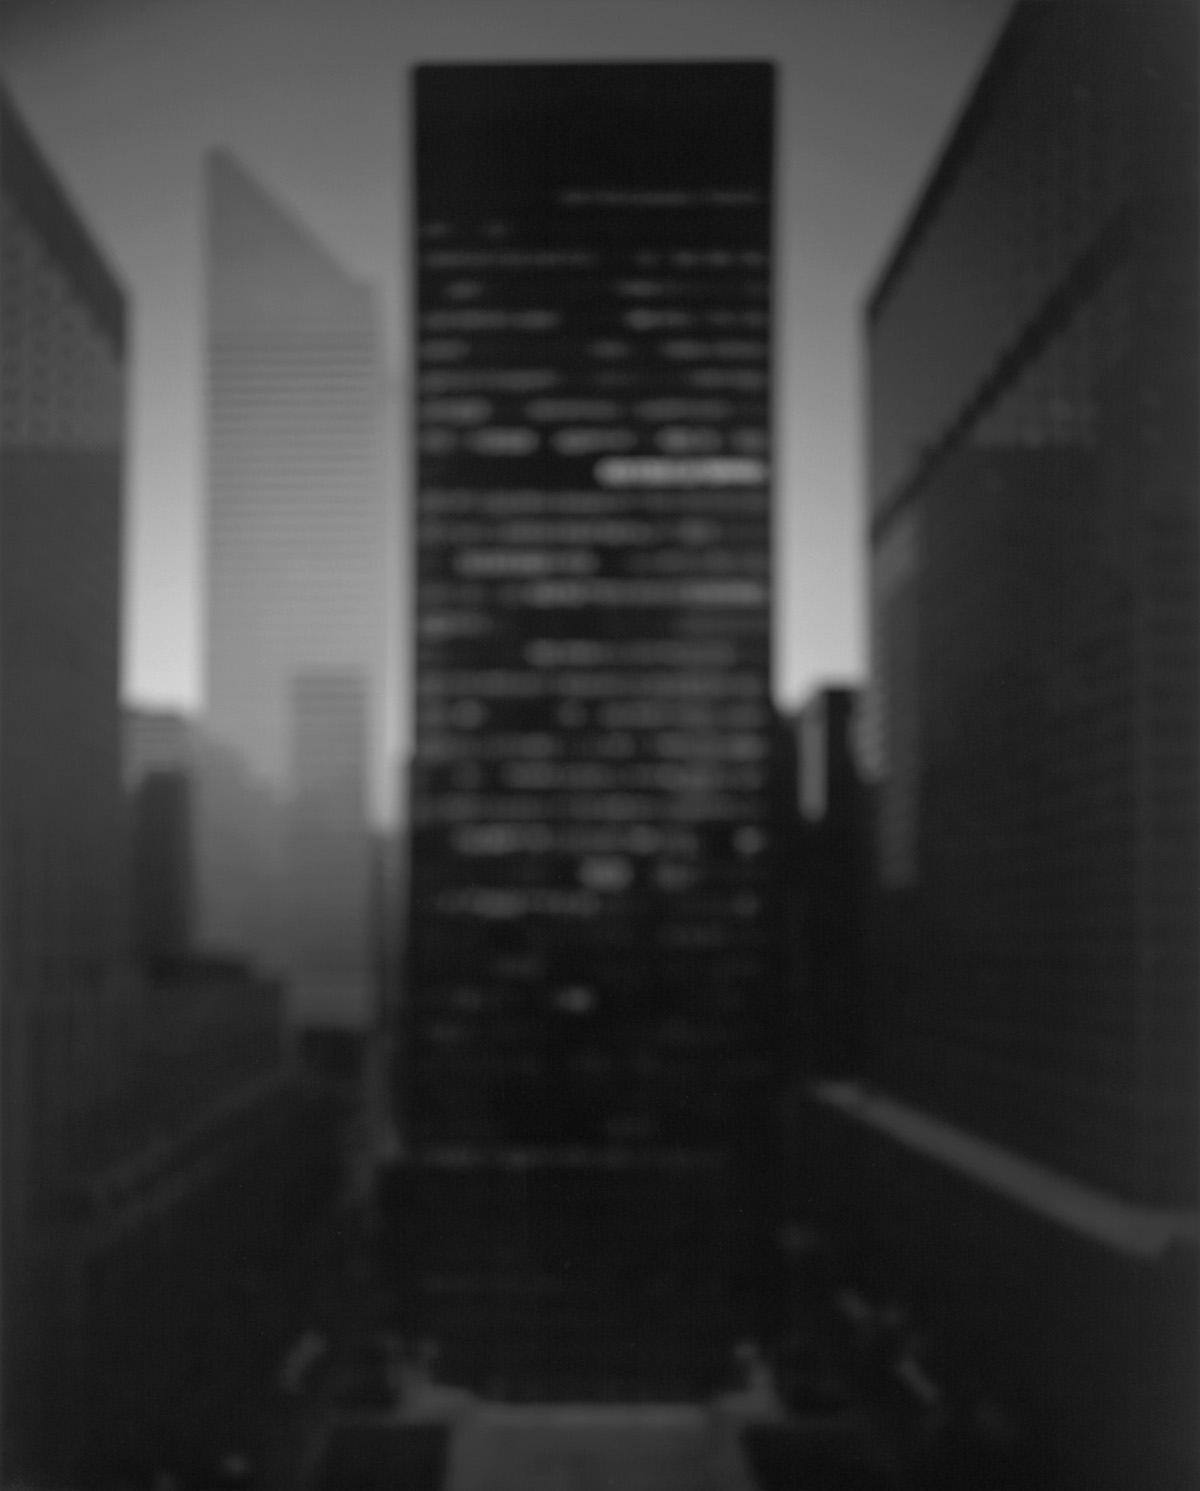 Hiroshi Sugimoto Gt Architecture 1997 2002 Hic Arquitectura